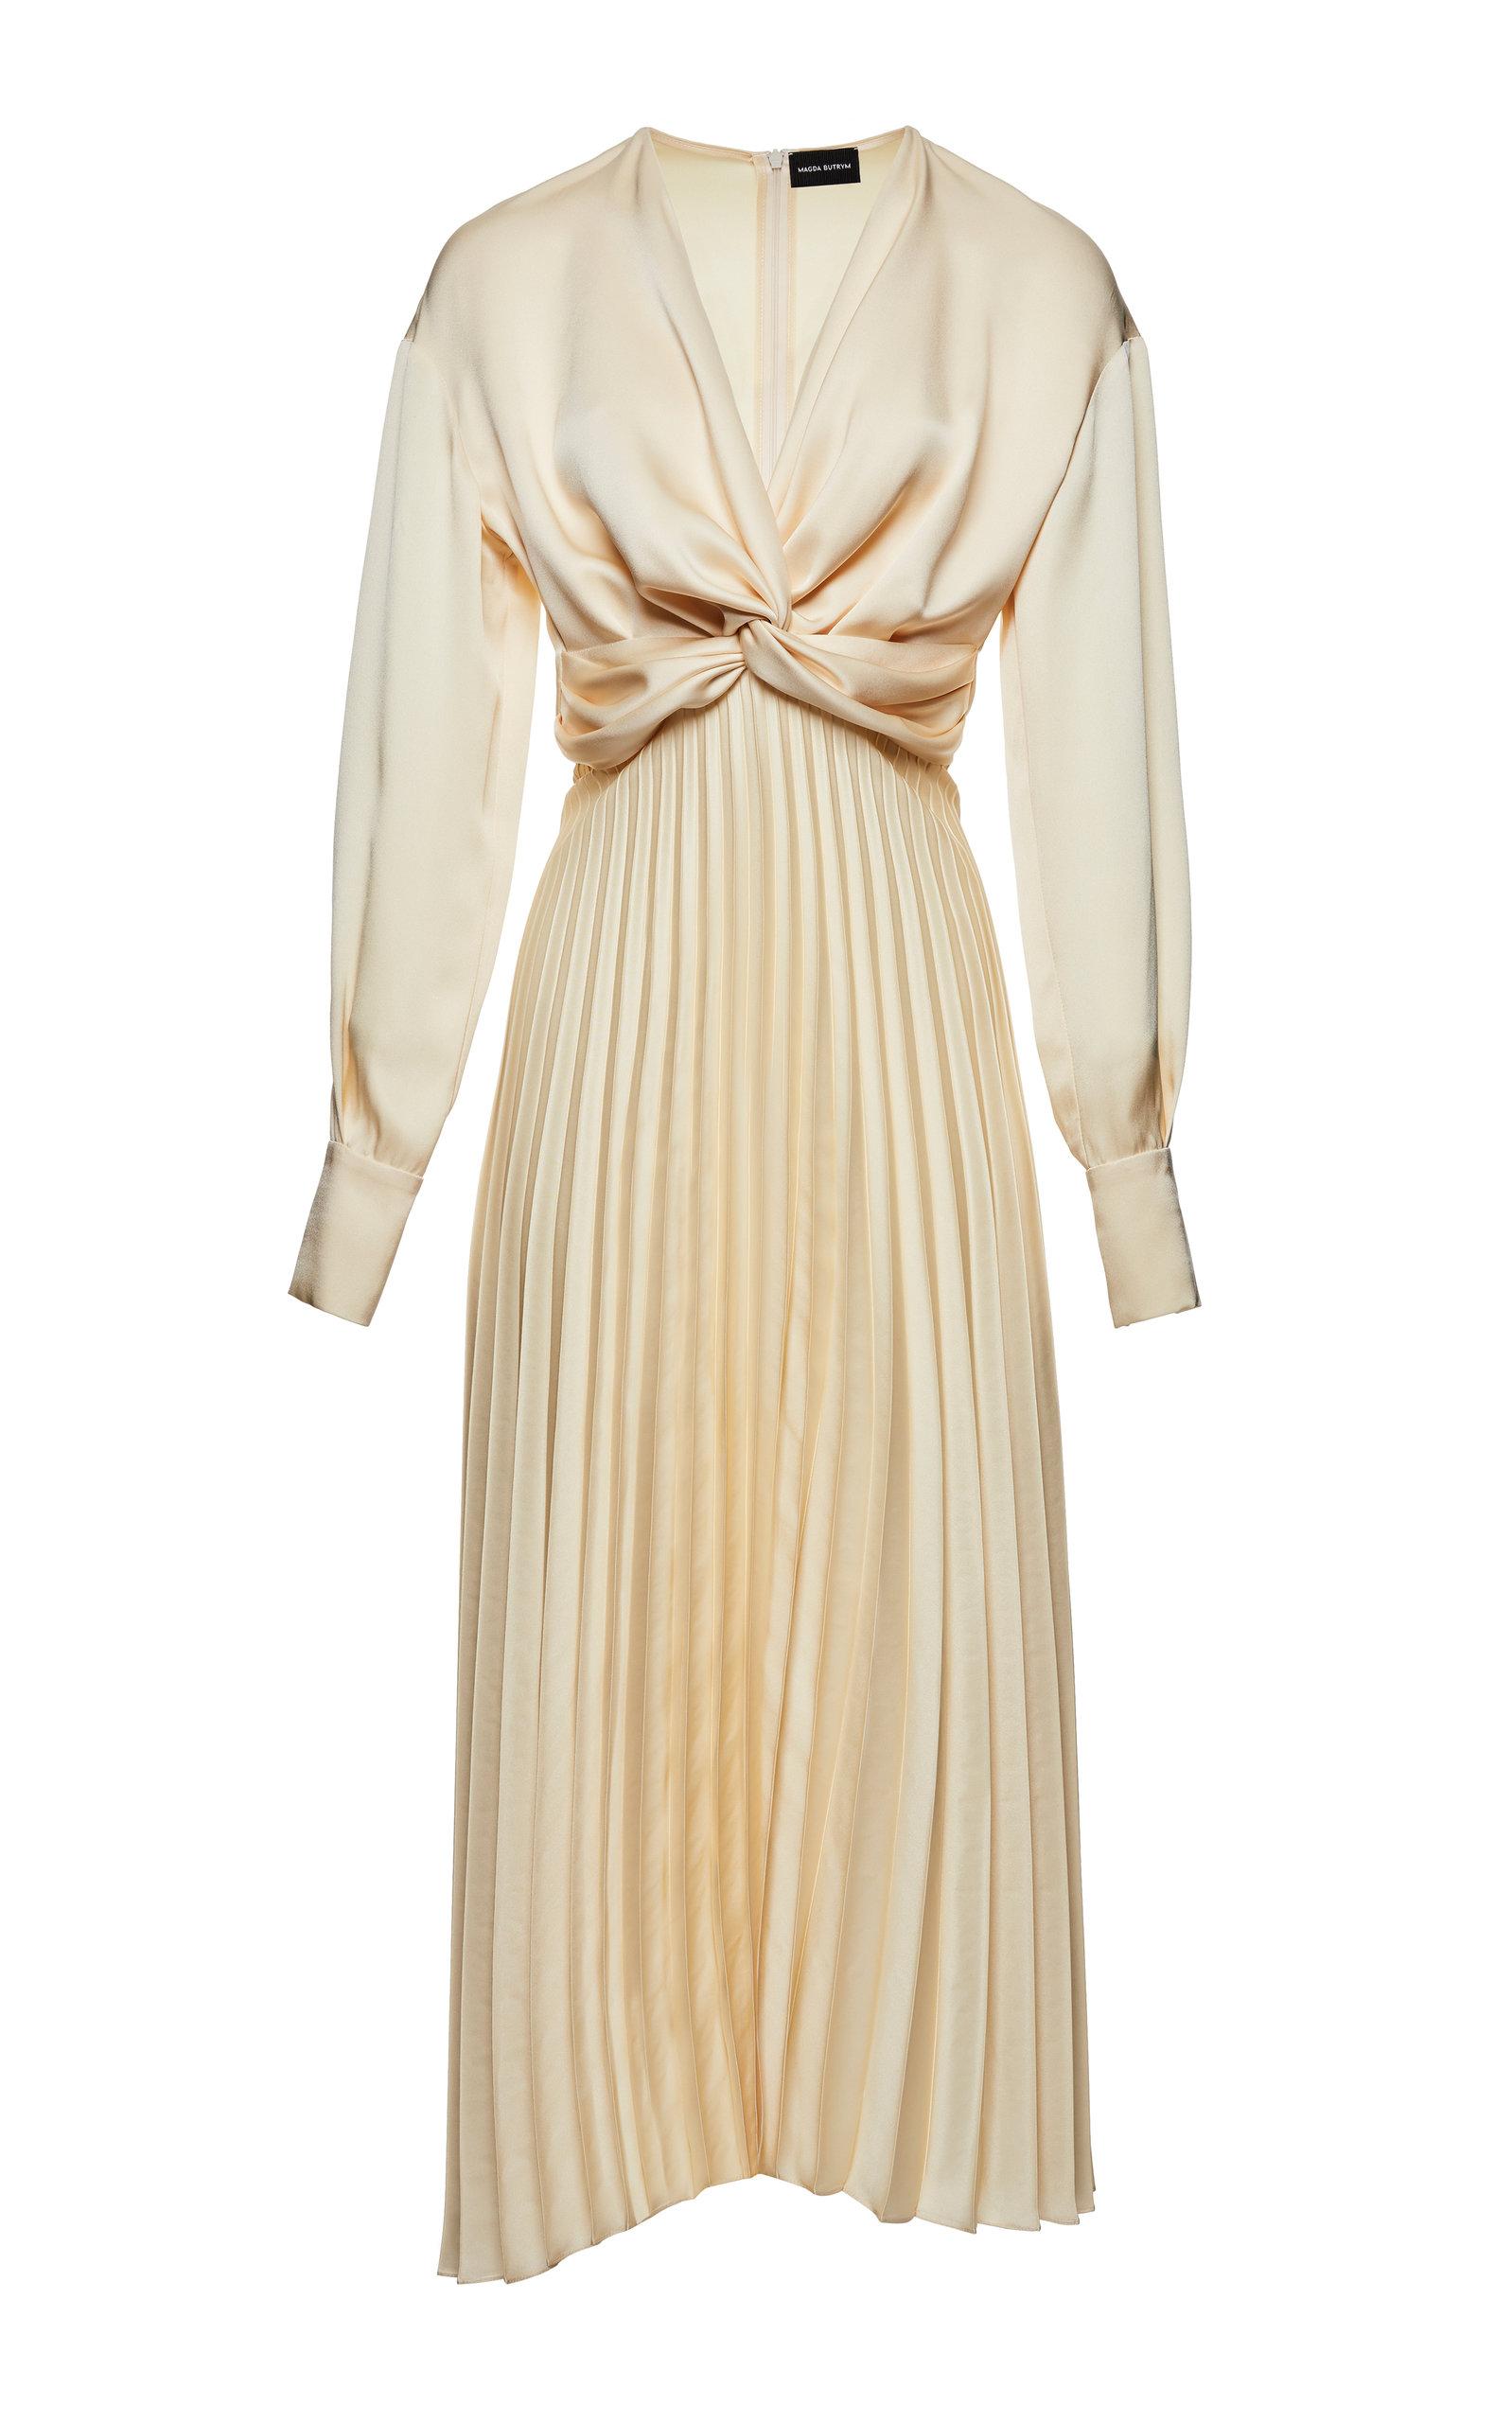 Buy Magda Butrym Milano Pleated Silk Dress online, shop Magda Butrym at the best price